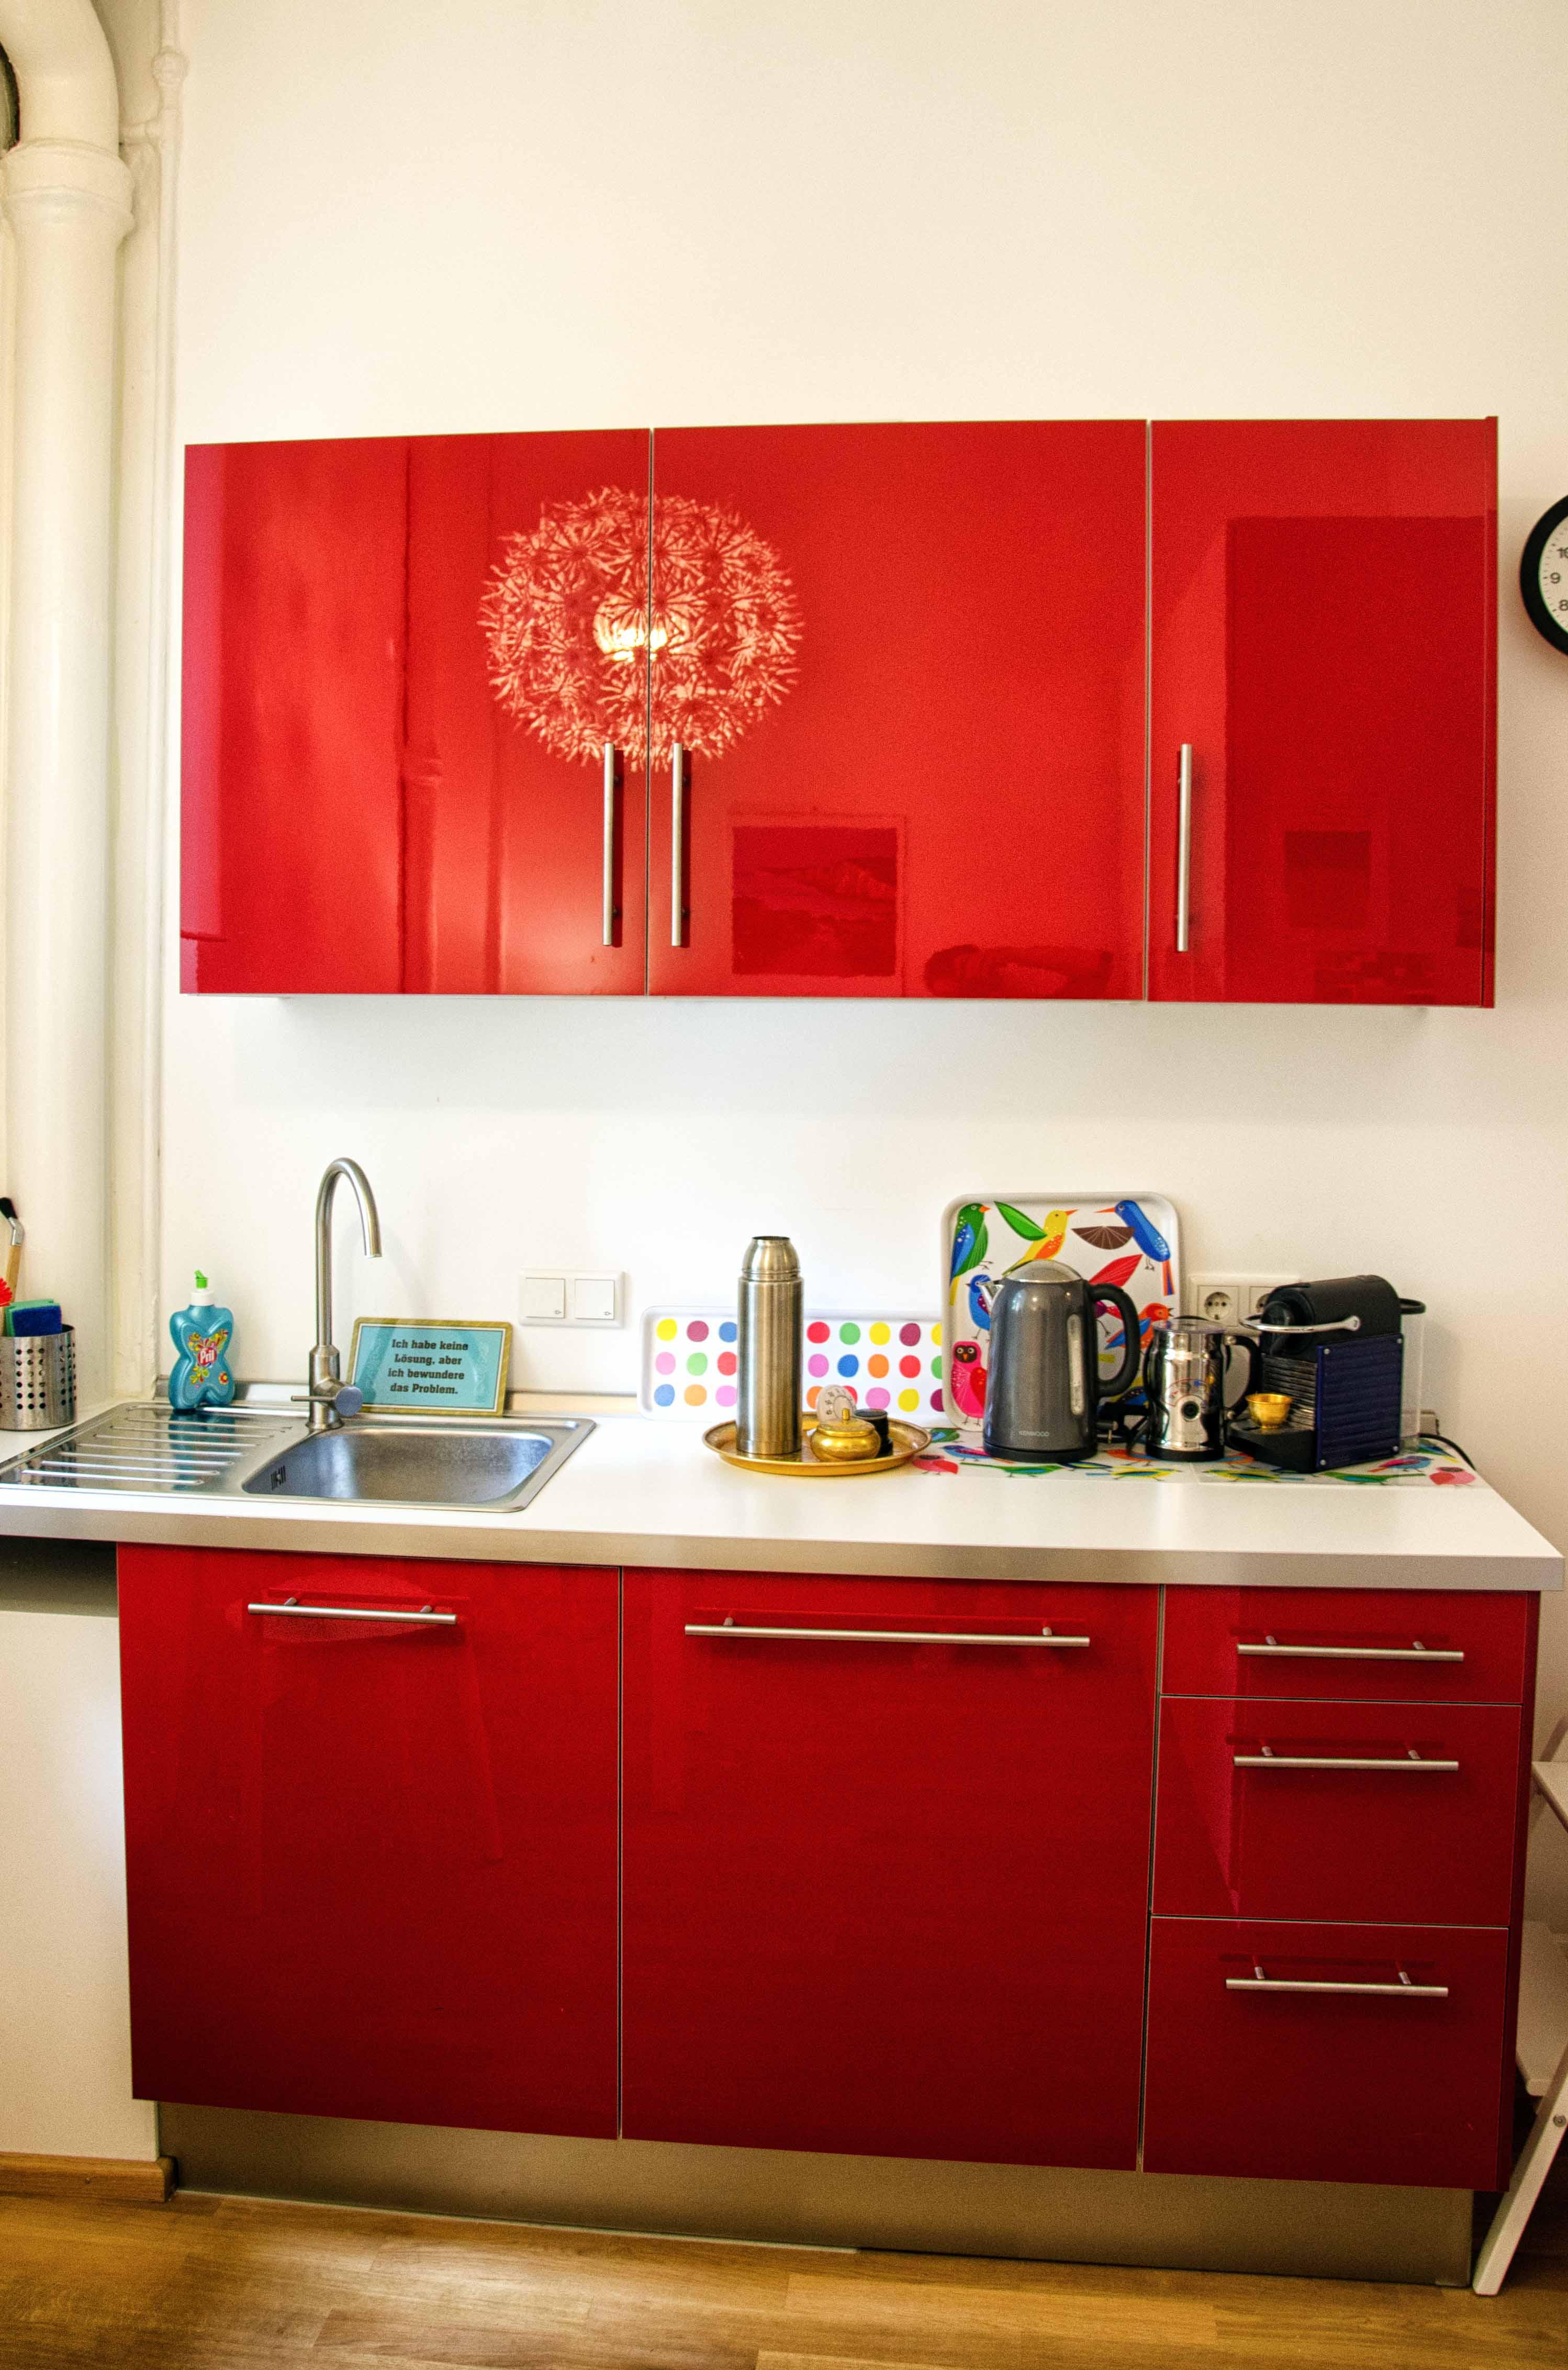 seminarraum mieten alexandra firak. Black Bedroom Furniture Sets. Home Design Ideas